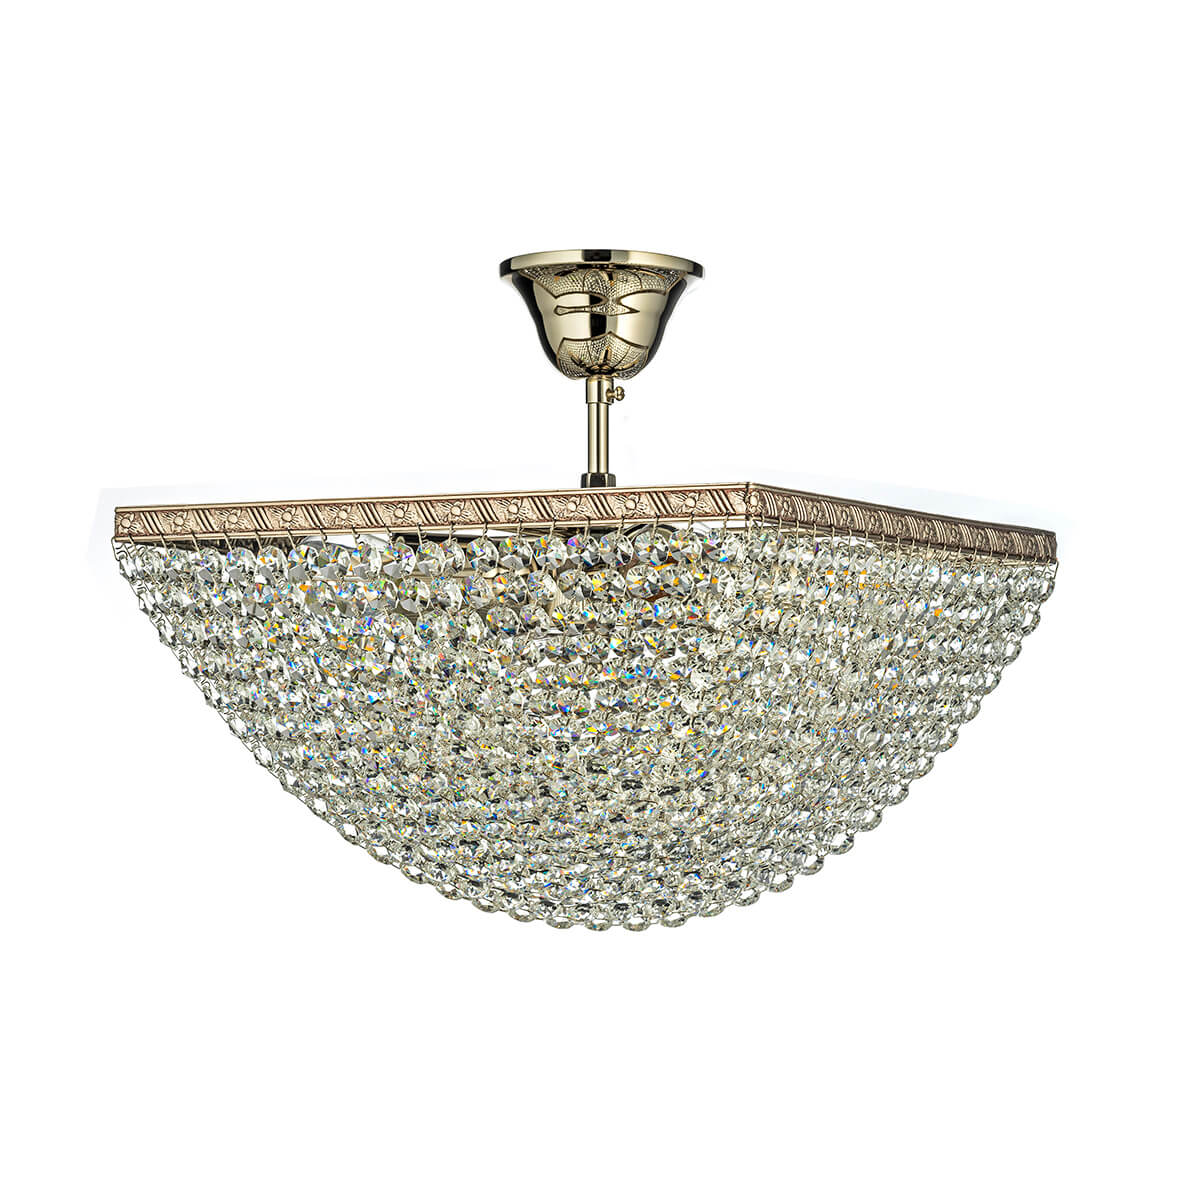 Потолочный светильник Arti Lampadari Nobile E 1.3.30.502 N